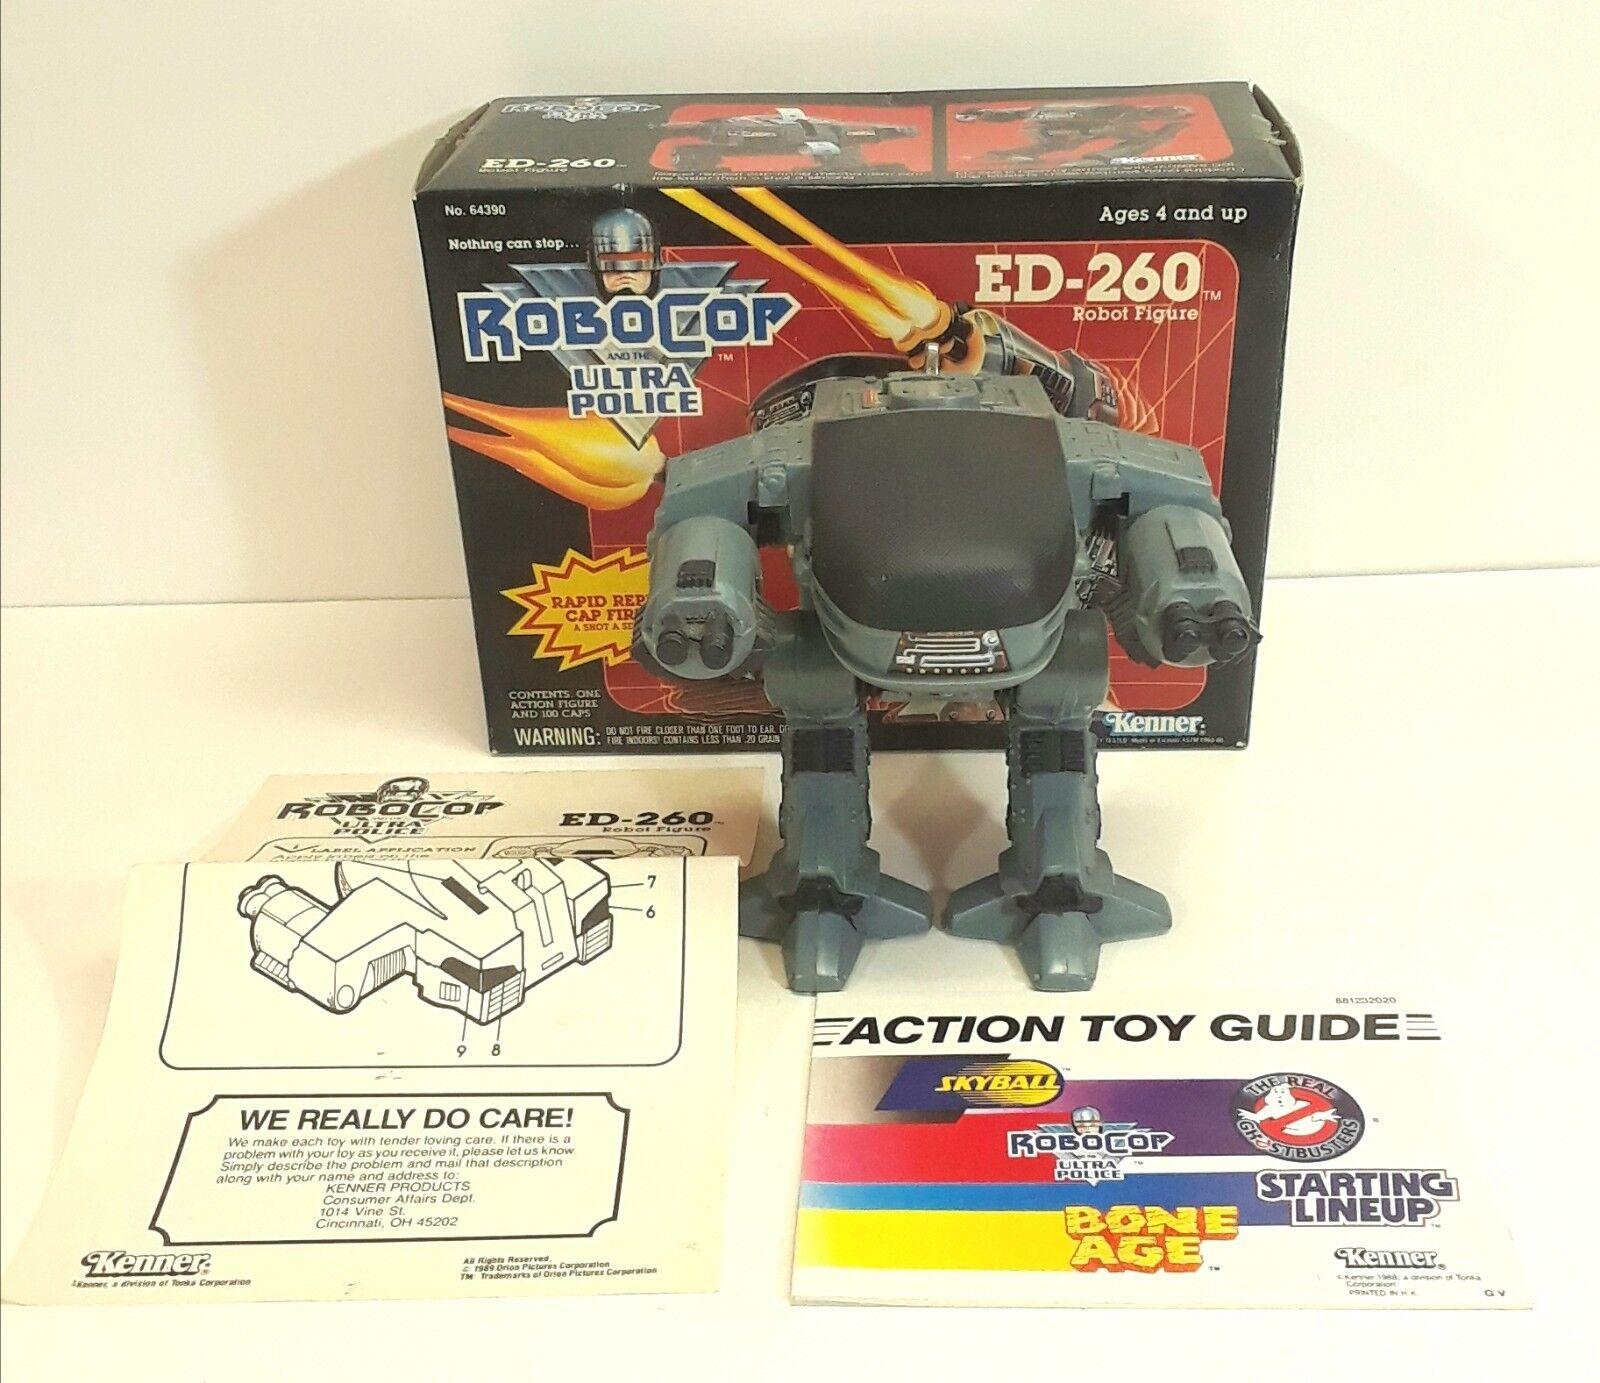 1988 Robocop Ultra Police ED-260 (ED-209) Robot Figure Kenner 64390